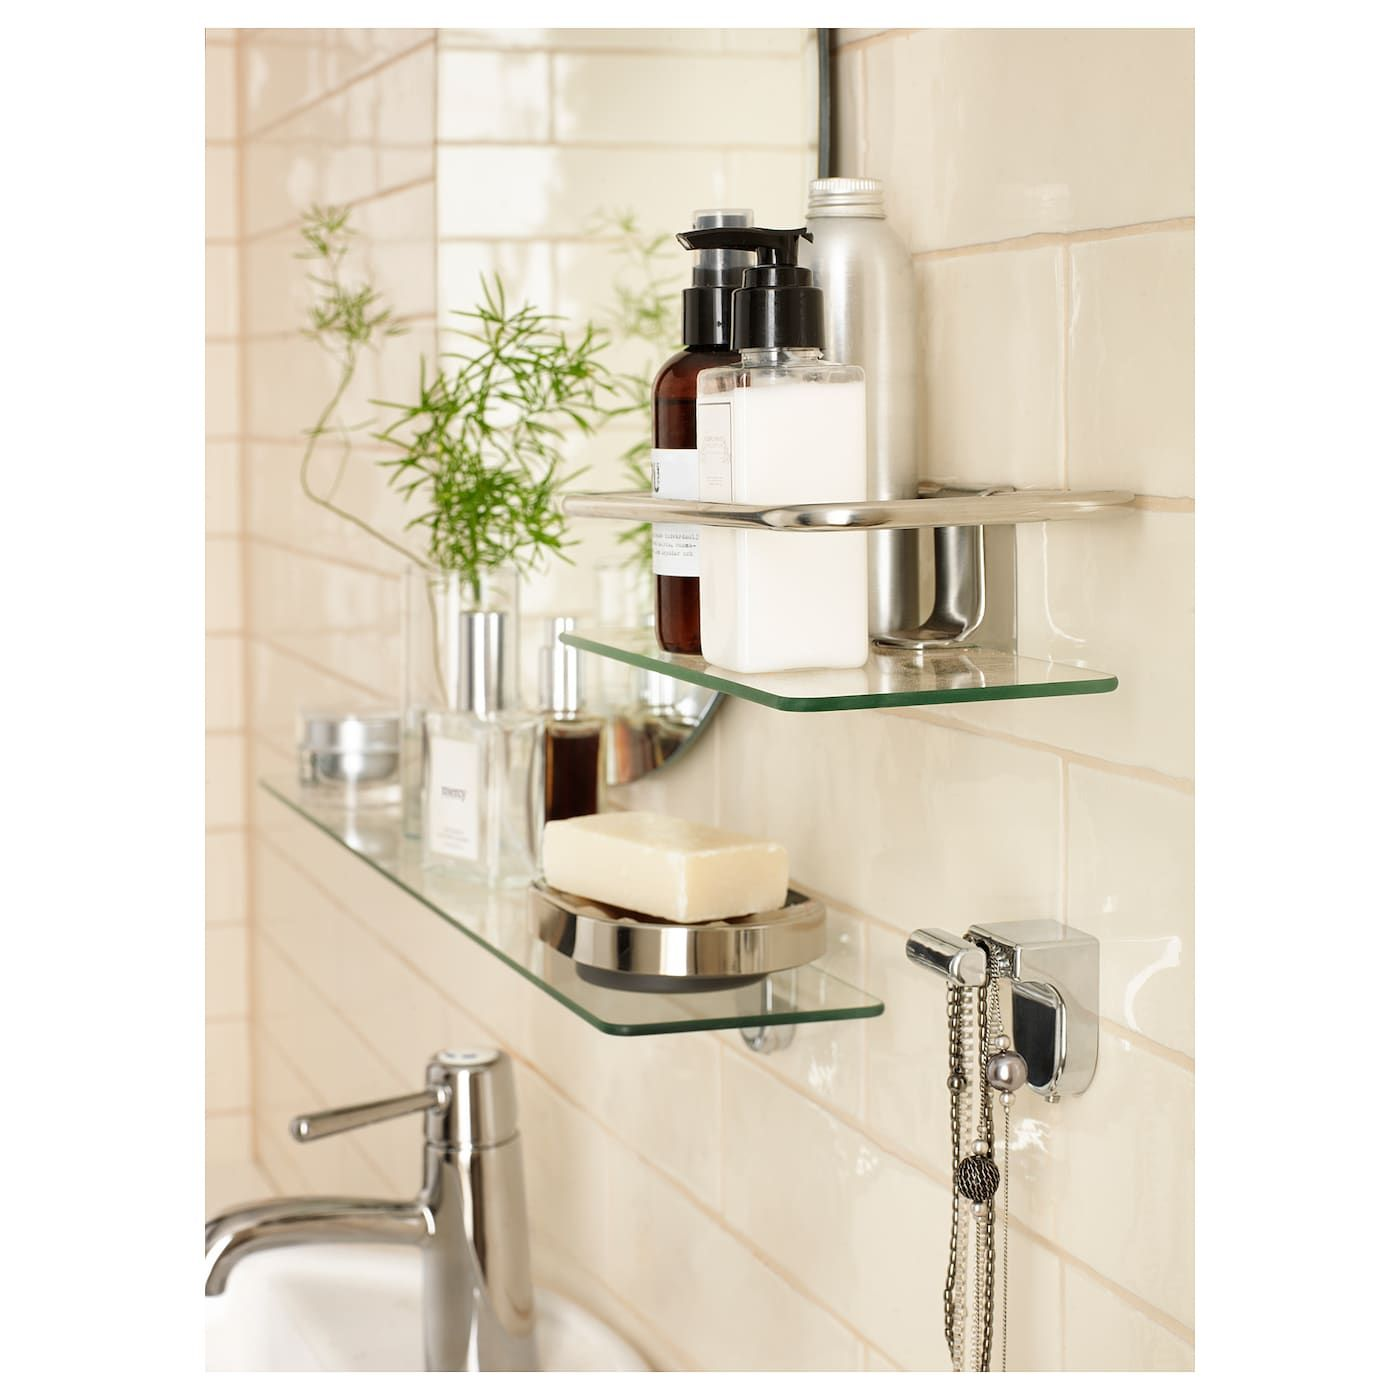 Kalkgrund Shower Shelf Chrome Plated 9 X2 Ikea Shower Shelves Glass Bathroom Glass Shelves In Bathroom